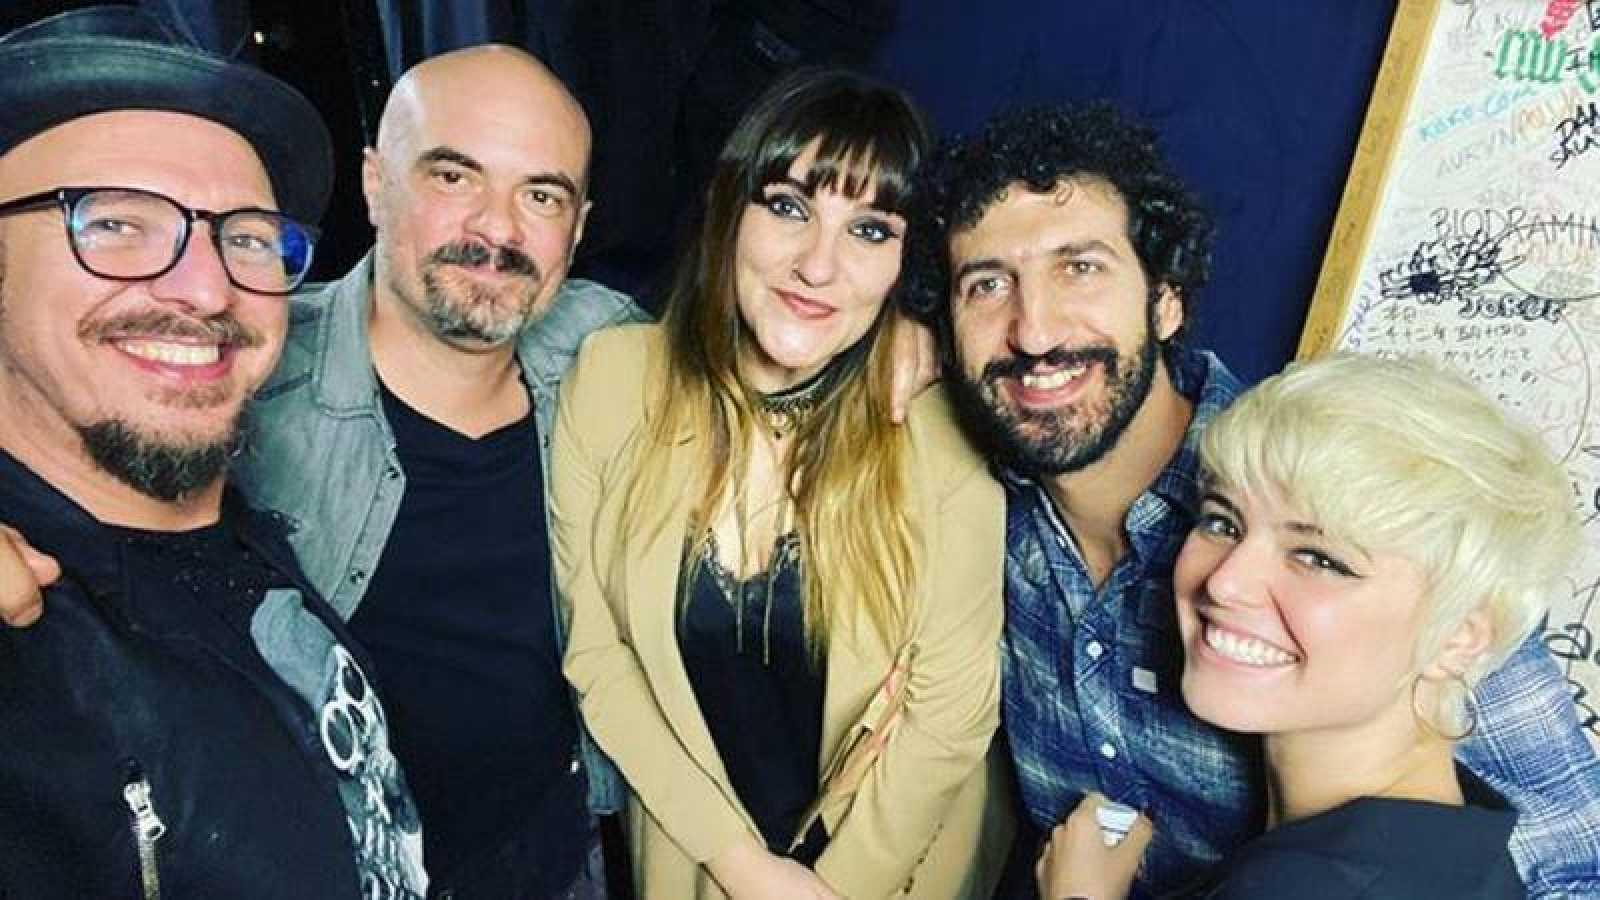 Marwan, Rozalén, Alba Reche, Lucas Pez e Ismael Guijarro en la sala Galileo Galilei